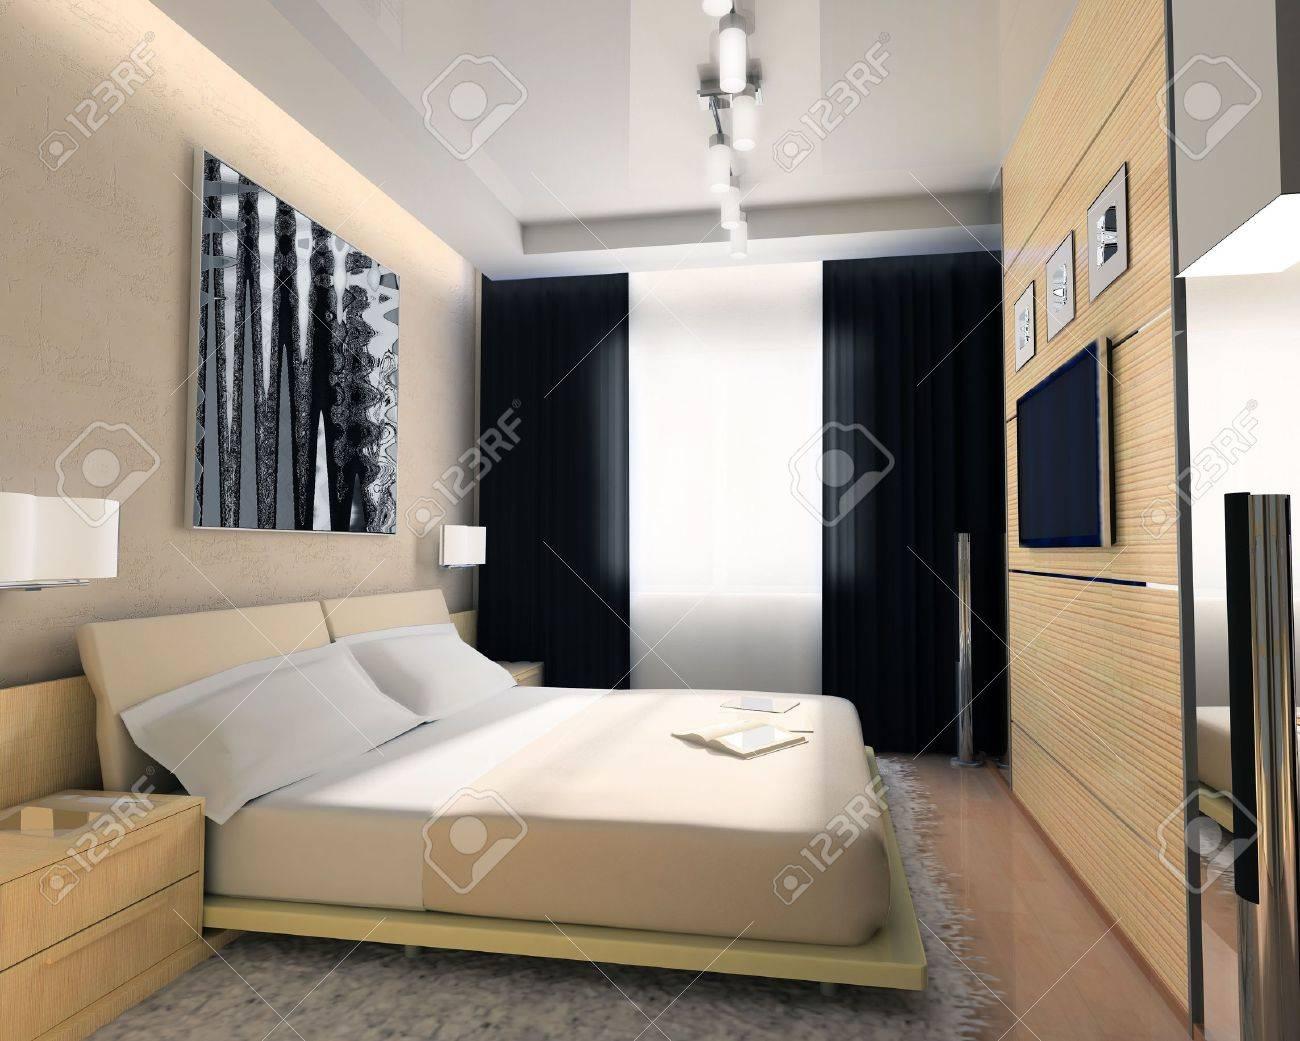 Interior of a sleeping room Stock Photo   899405. Interior Of A Sleeping Room Stock Photo  Picture And Royalty Free